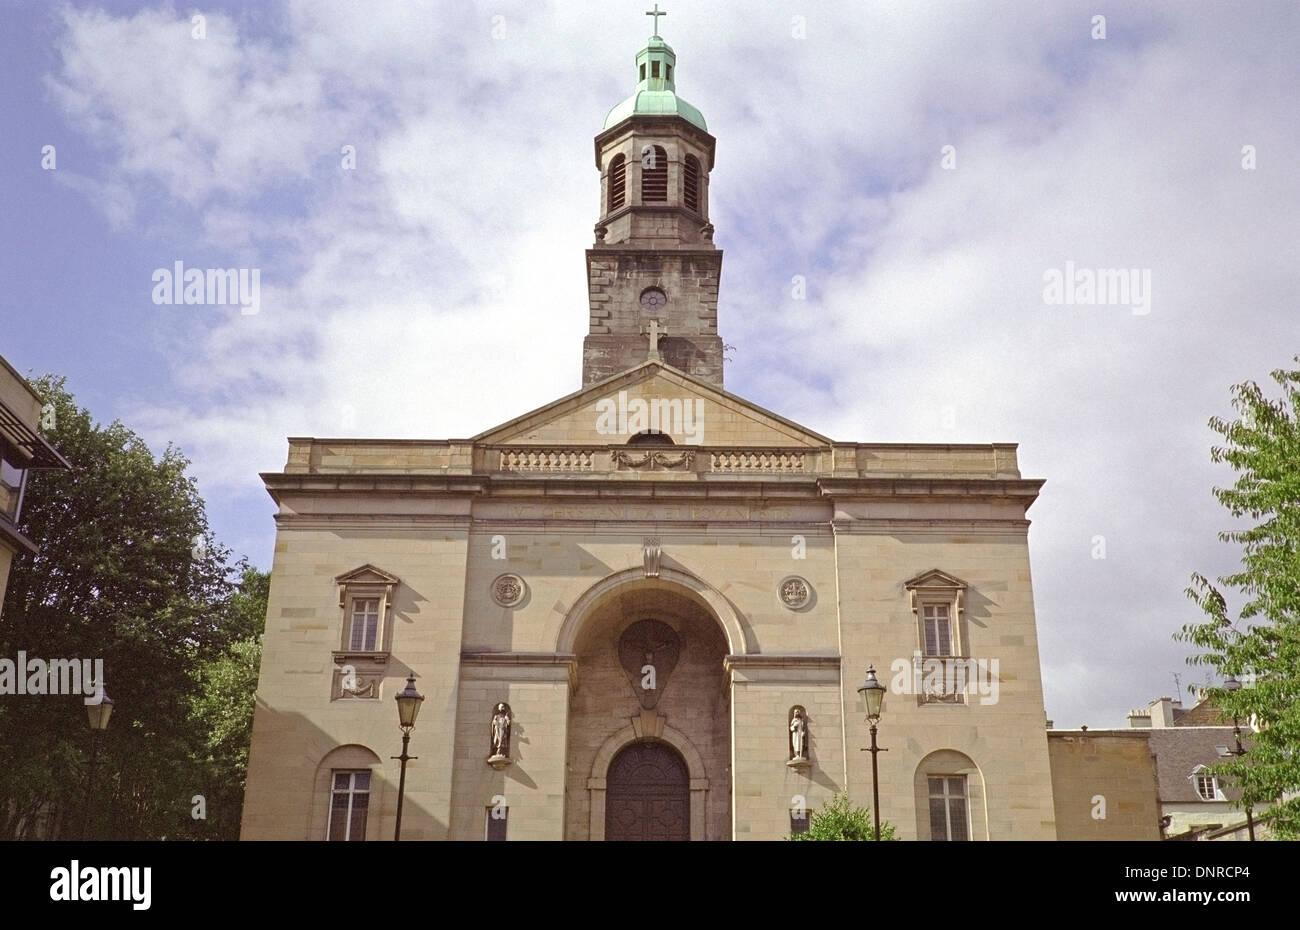 St Patrick's Parish Roman Catholic Church, South Gray's Close, High Street, Edinburgh, Scotland, UK - Stock Image